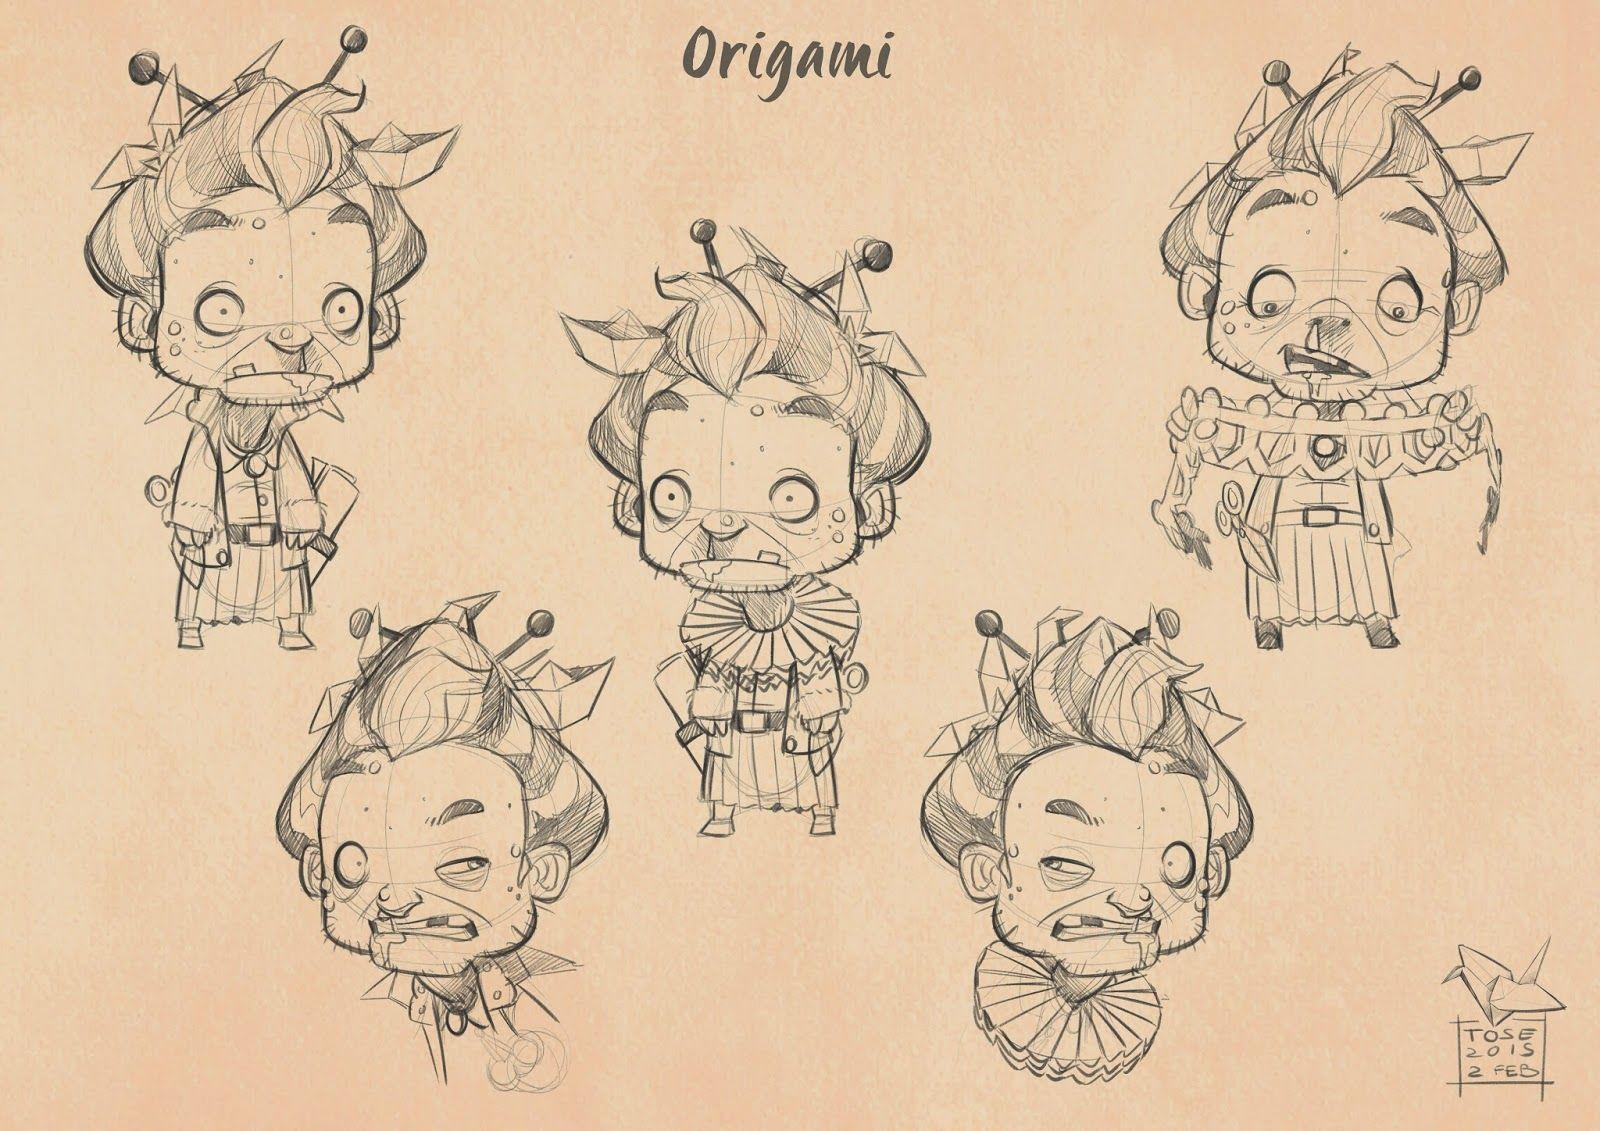 Davide Tosello Arte: Origami - diseño de personajes